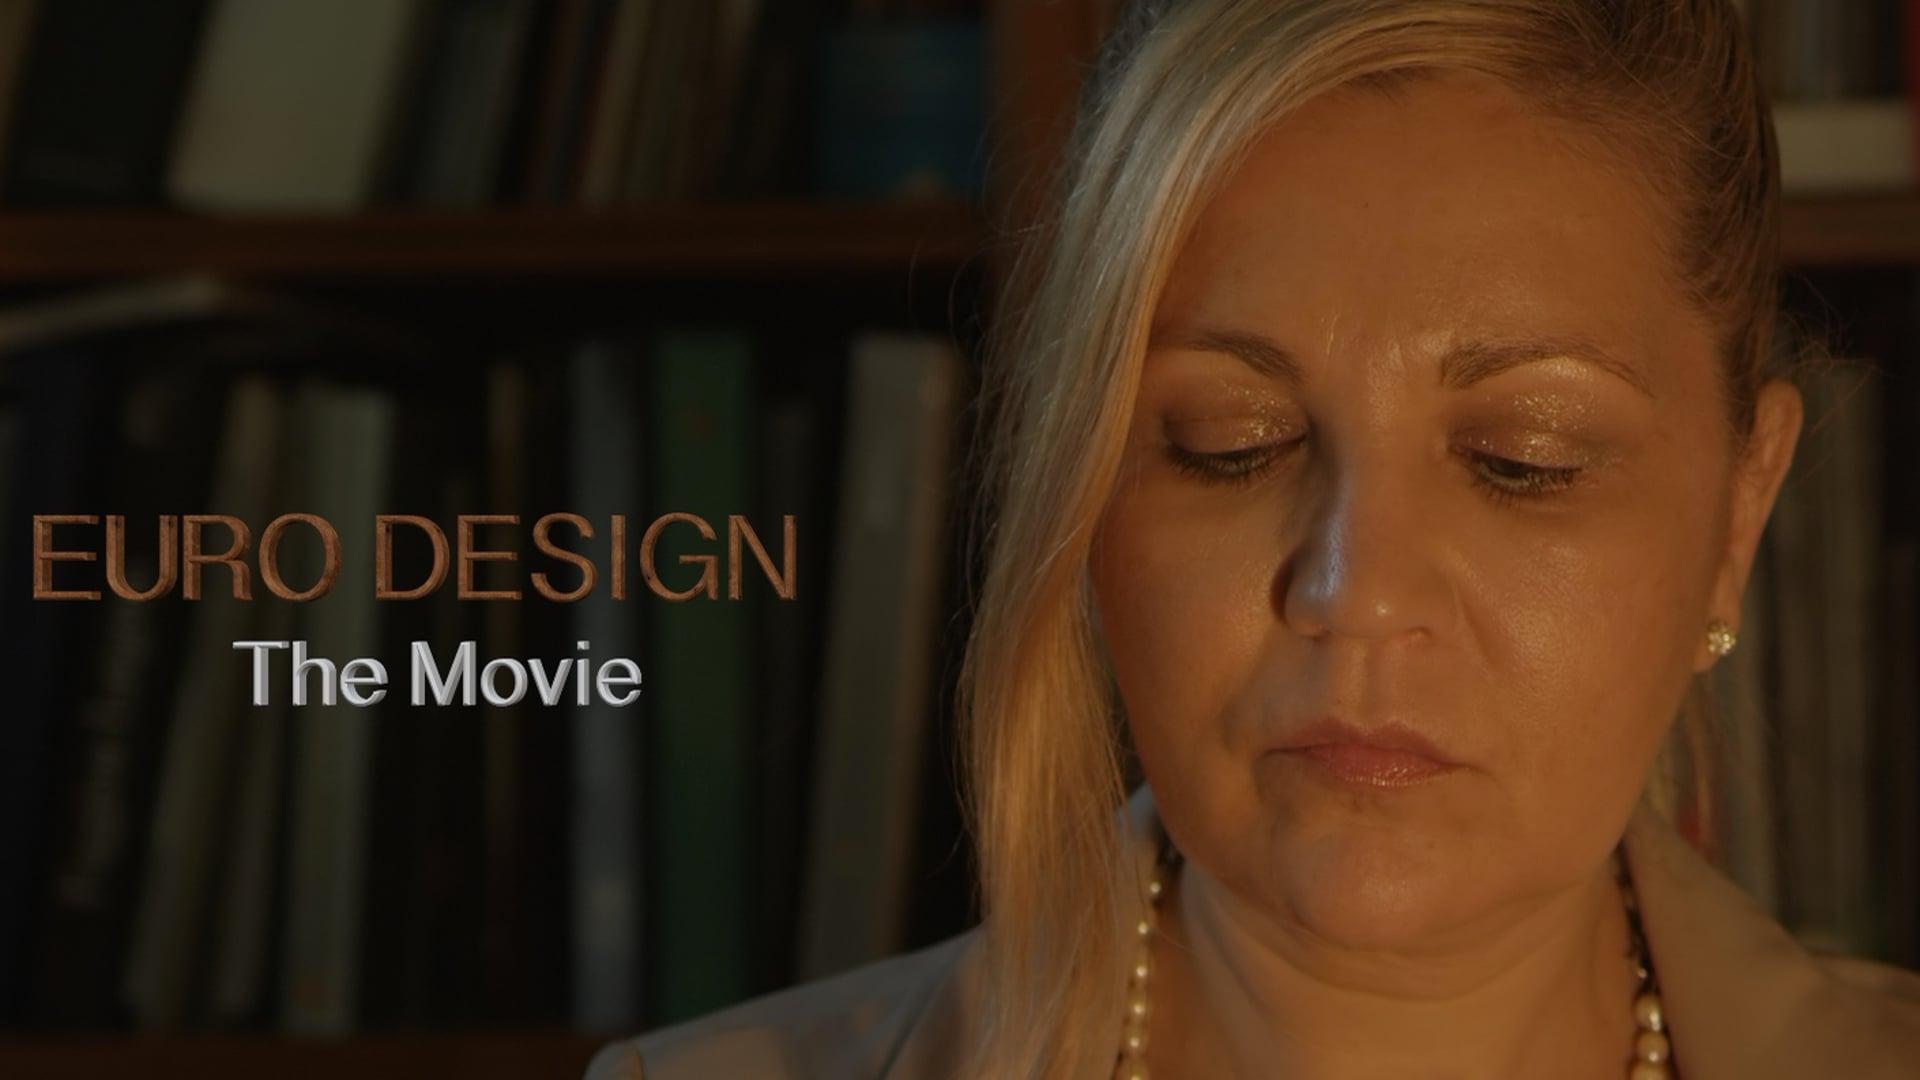 EURO DESIGN - The Movie